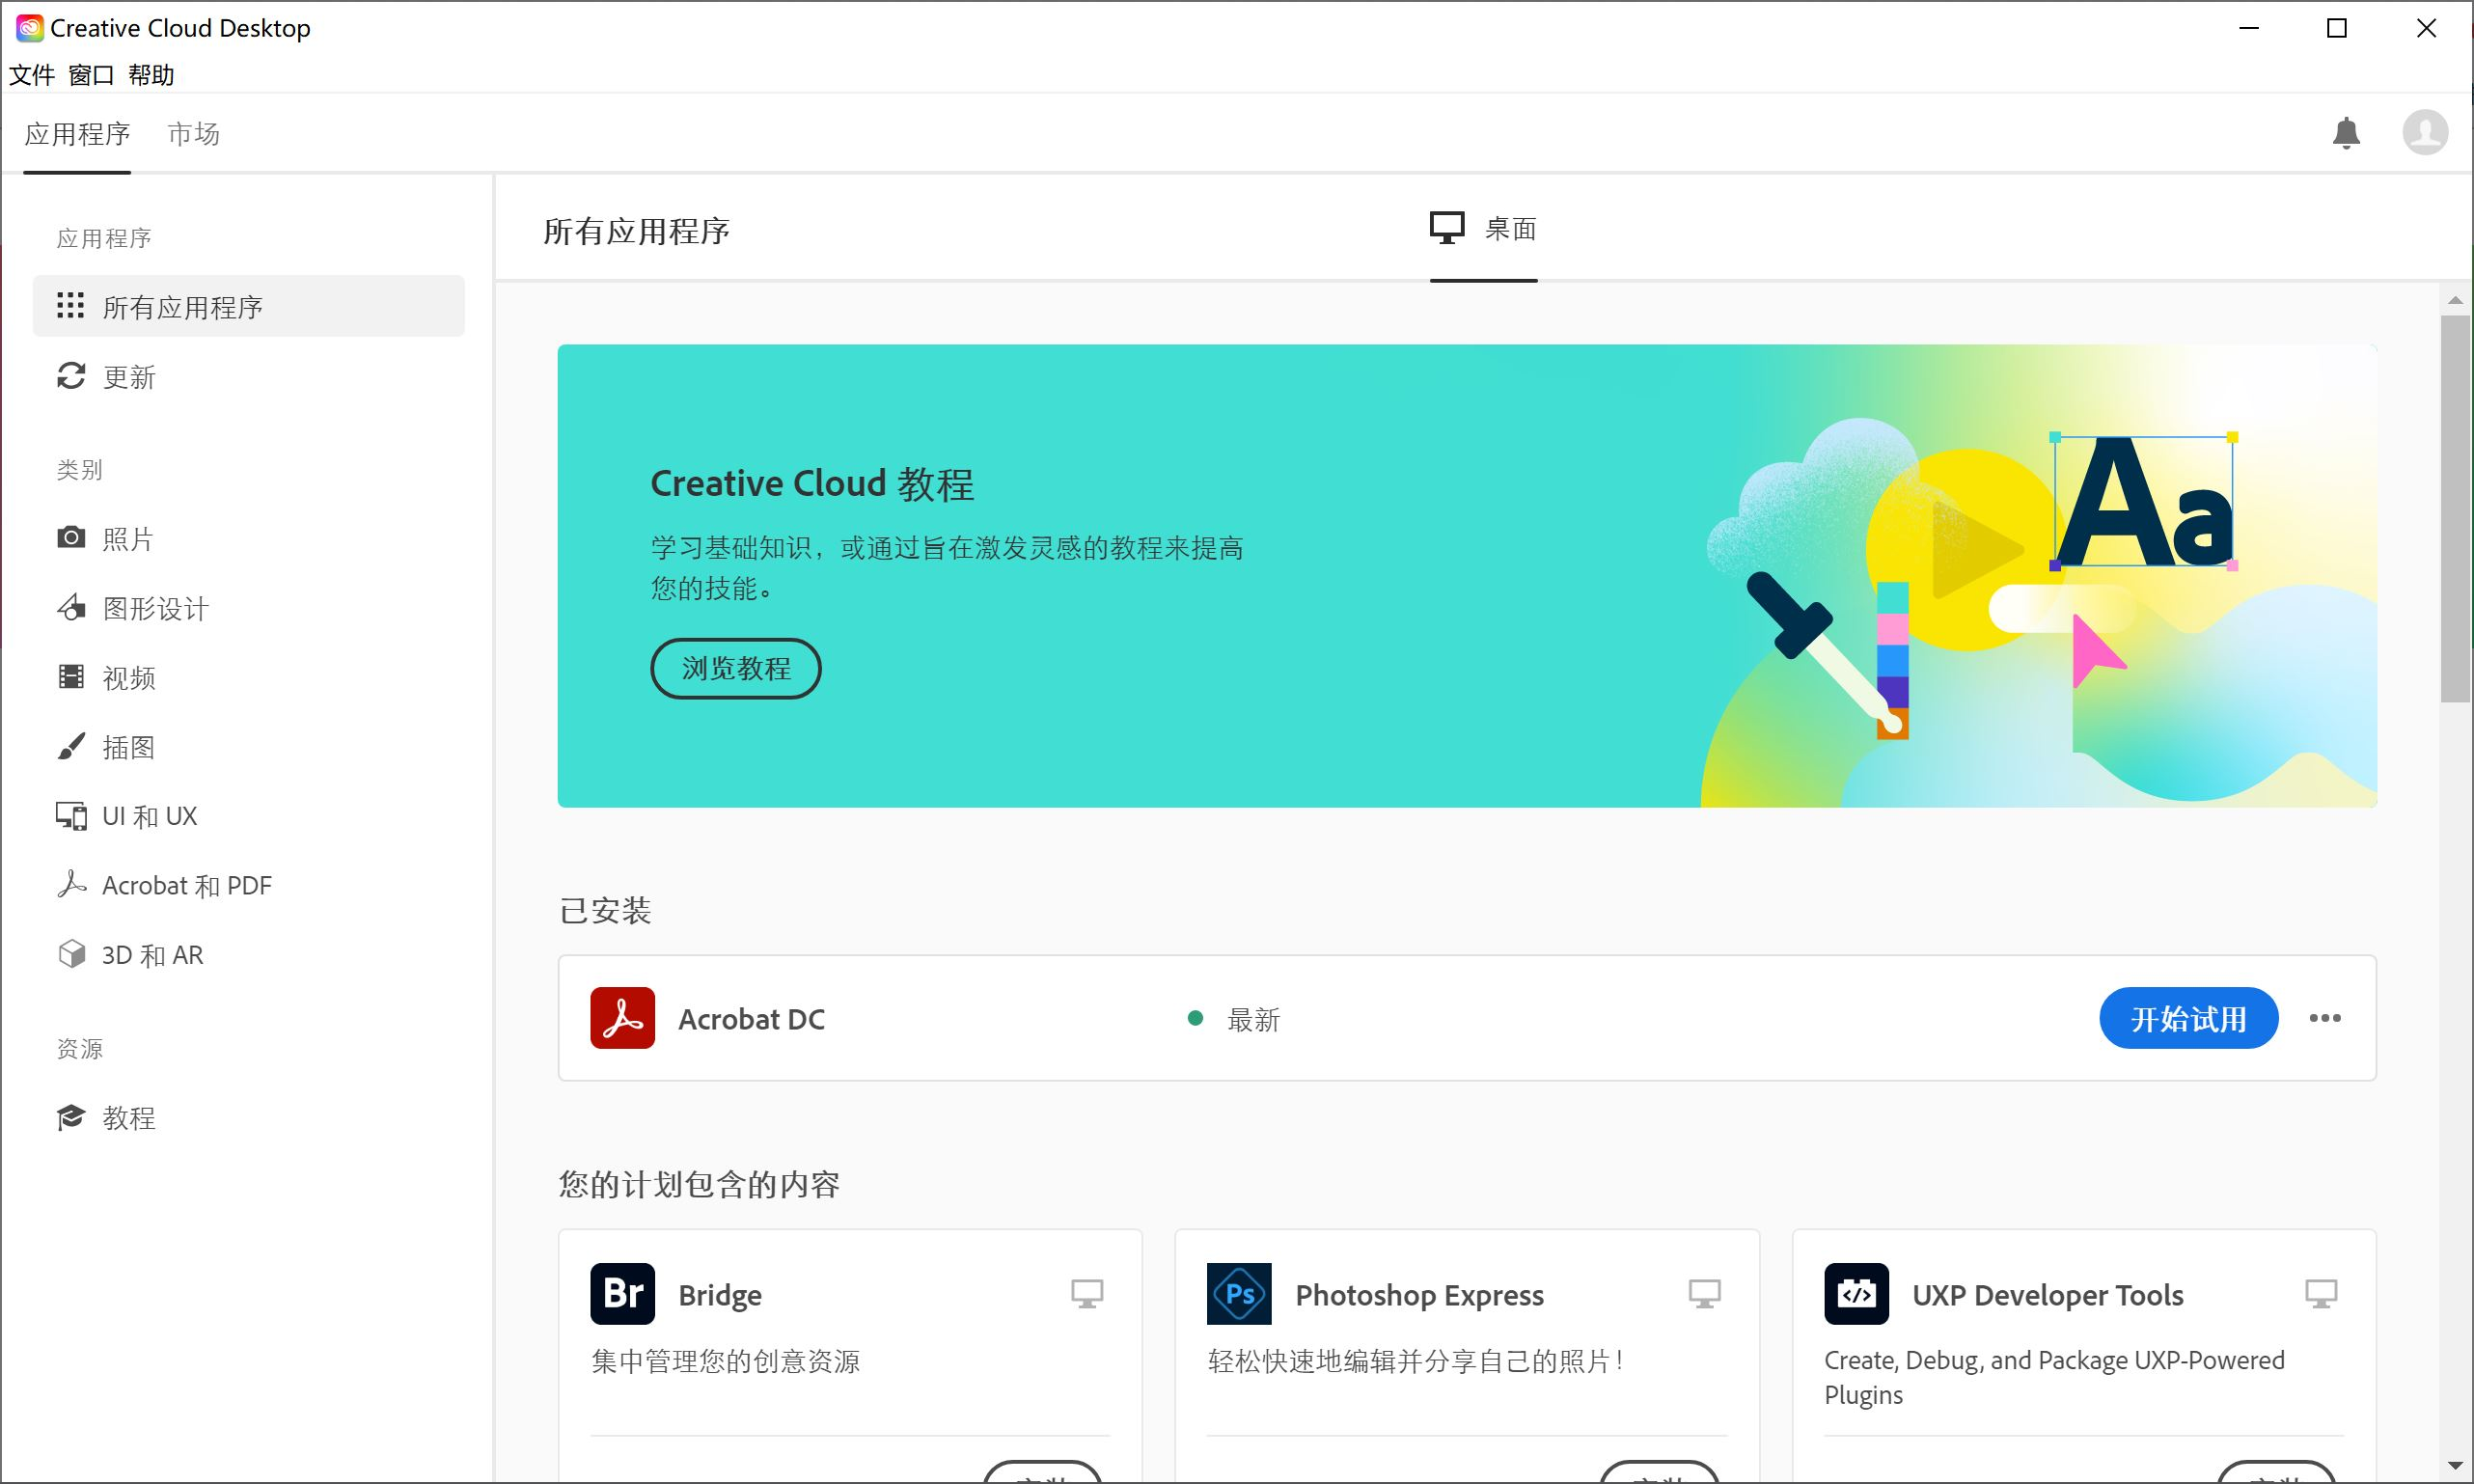 [软件]Adobe Creative Cloud 2021 for Windows 创意应用软件